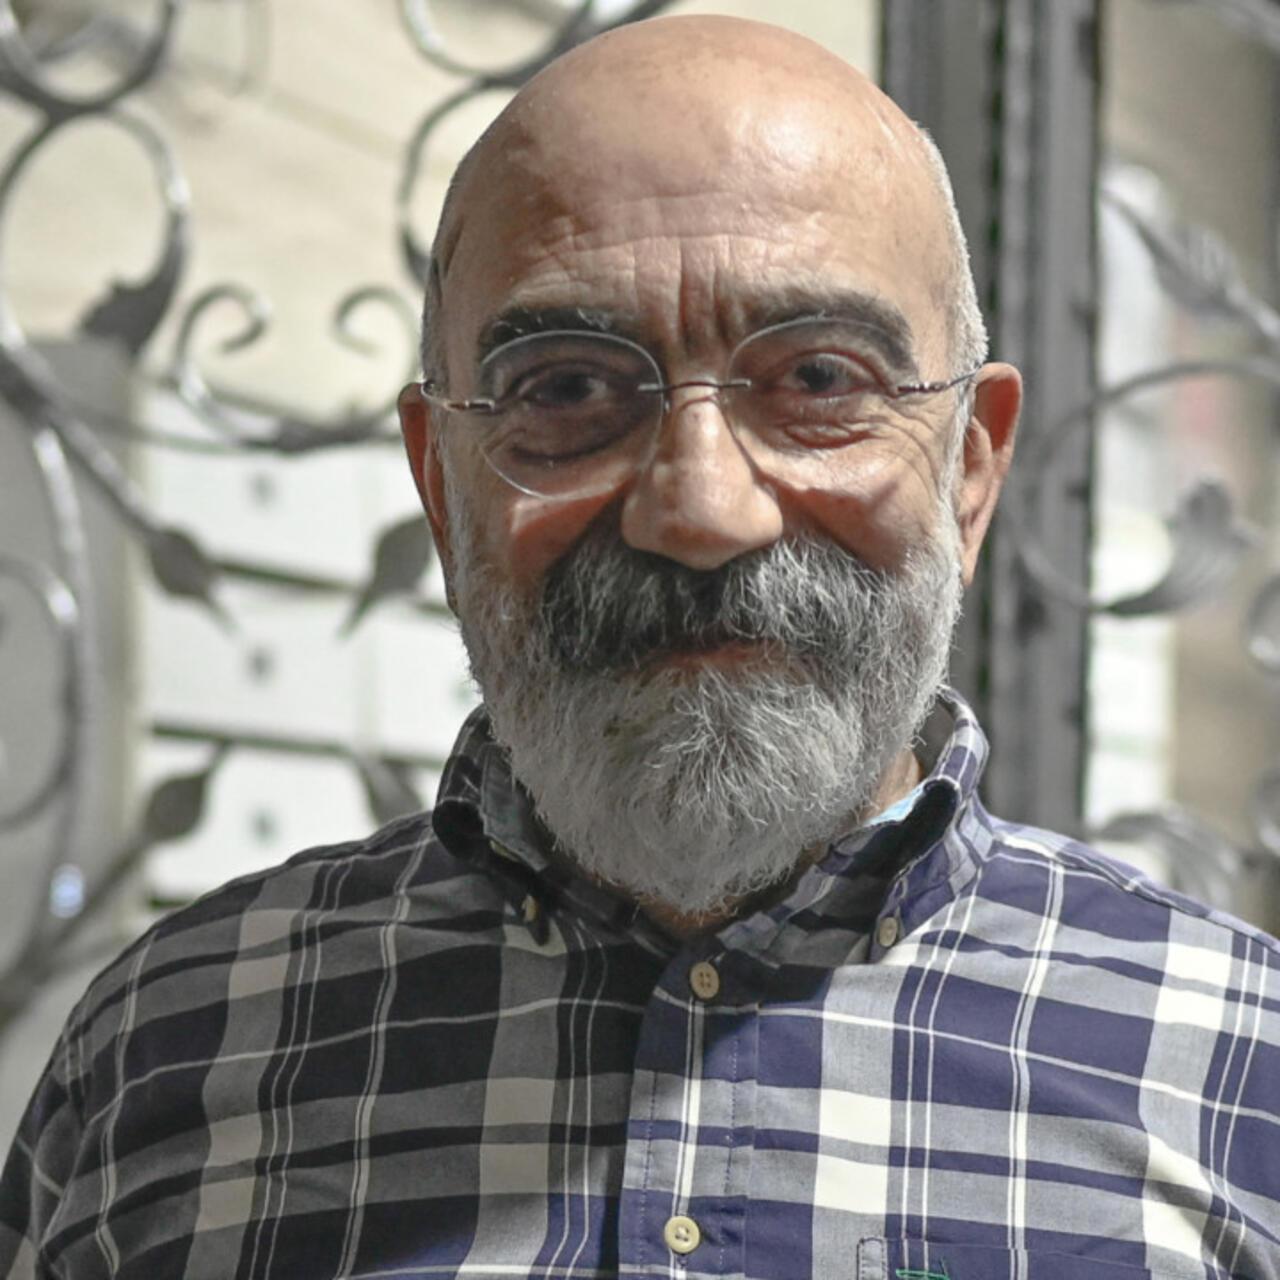 Intalnirea omului turc in Fran? a